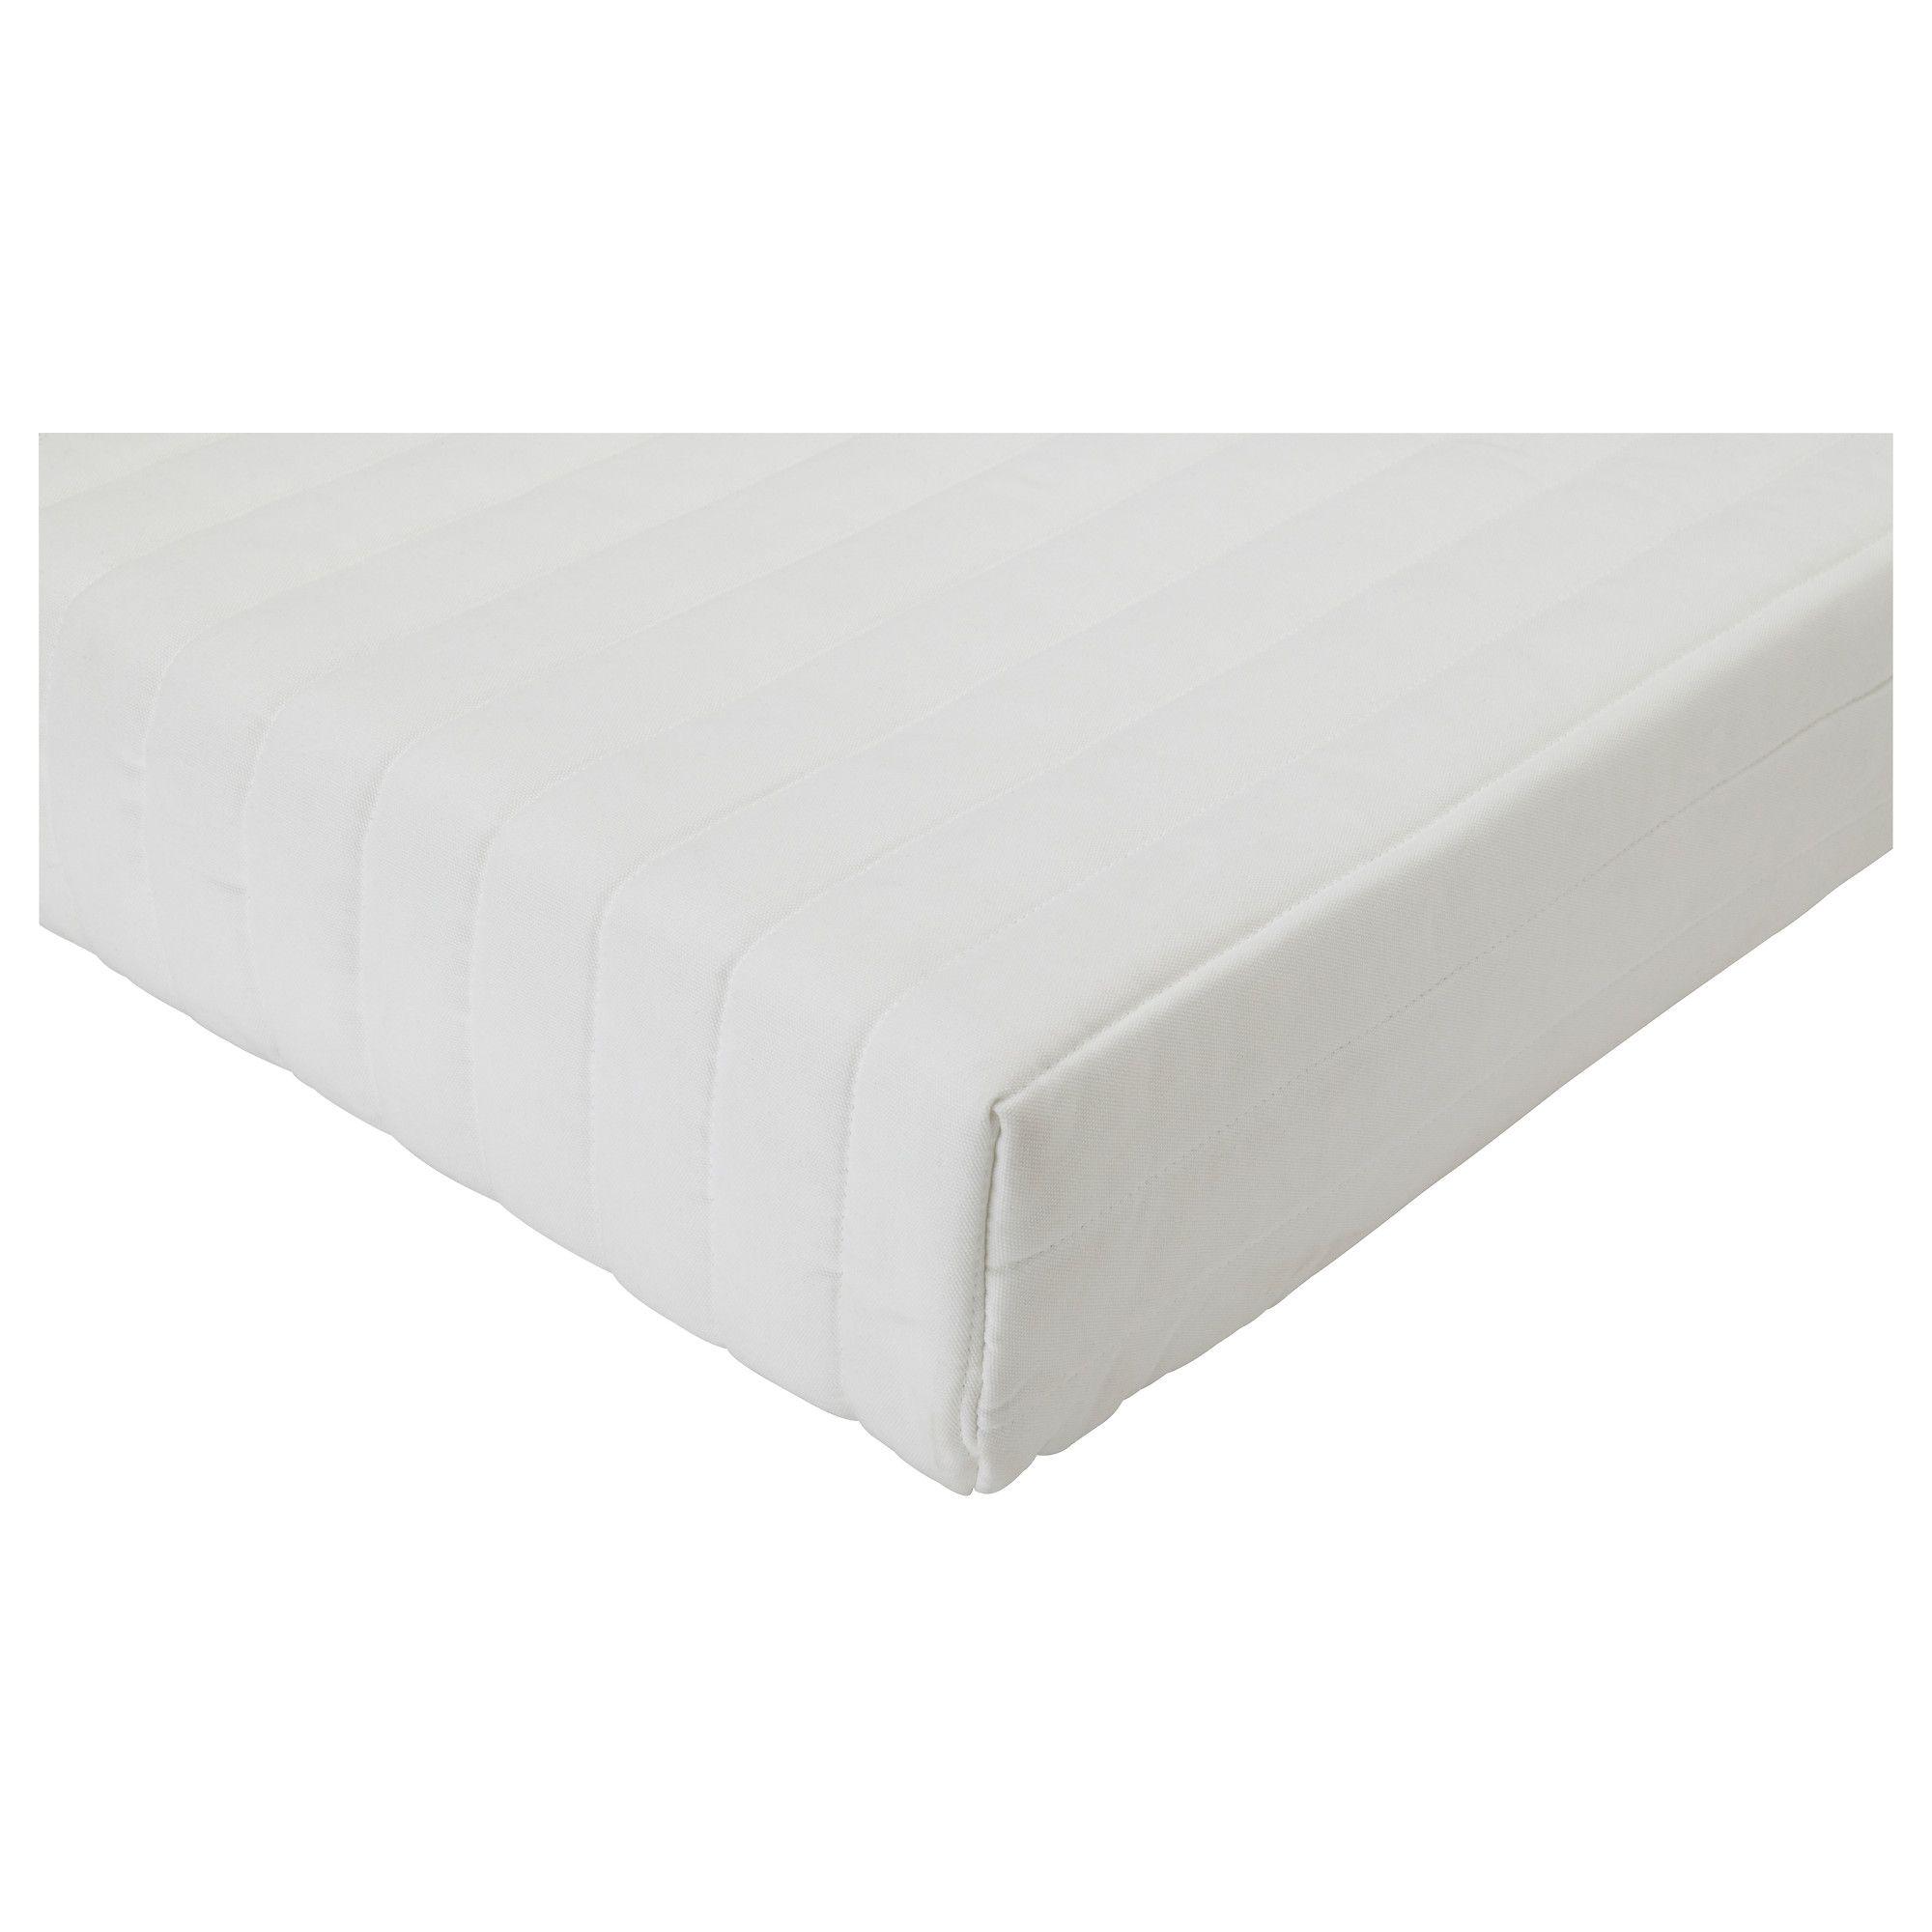 beddinge resmo mattress ikea furniture pinterest mattress storage beds and storage. Black Bedroom Furniture Sets. Home Design Ideas